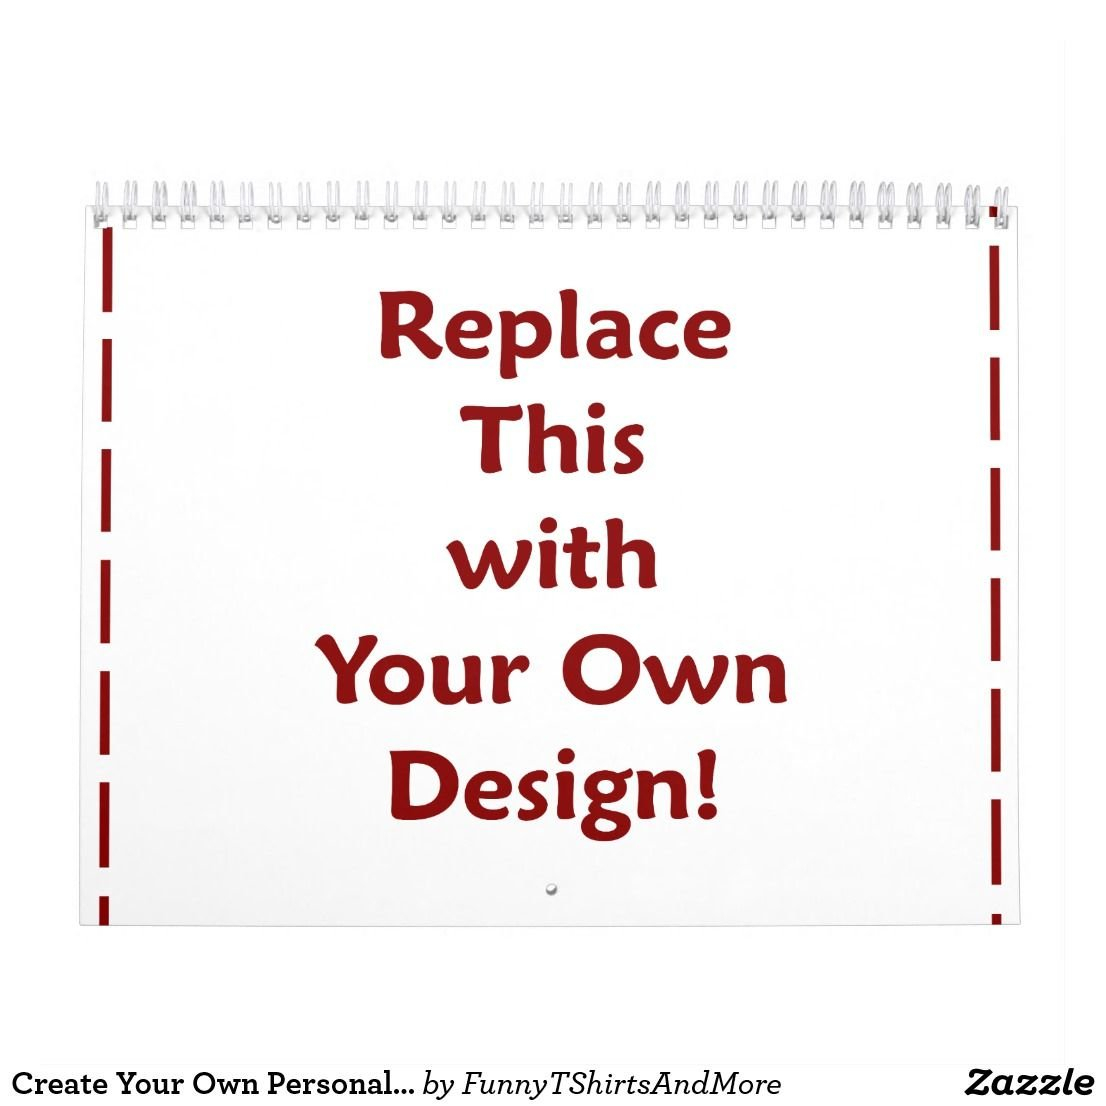 Create Your Own Personalized Custom 2019 Diy Calendar | Zazzle Calendar 2019 Create